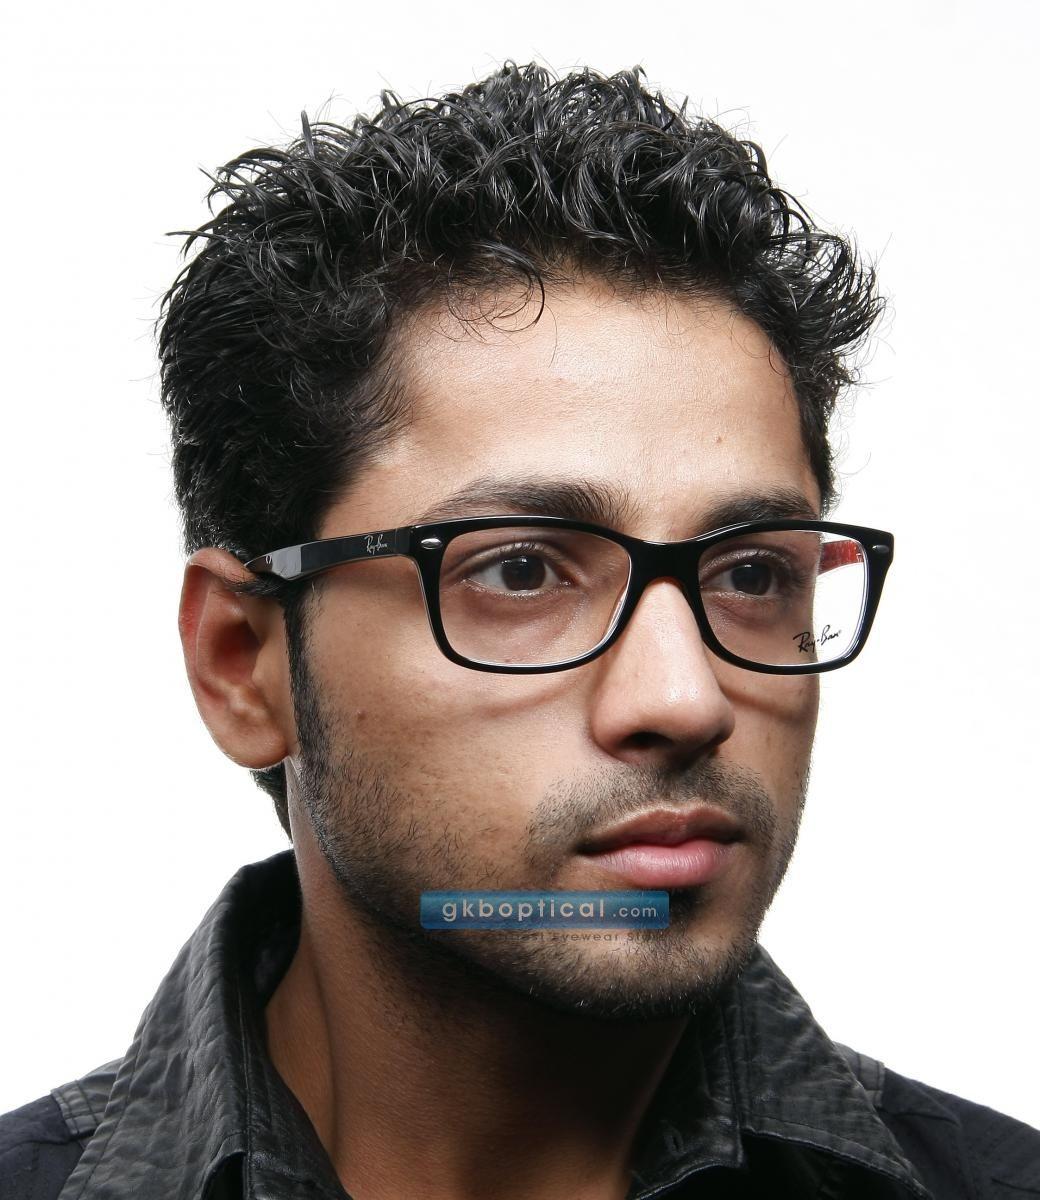 Rayban Rb5228 Spectacles Eyeframe Eyeglasses Glasses